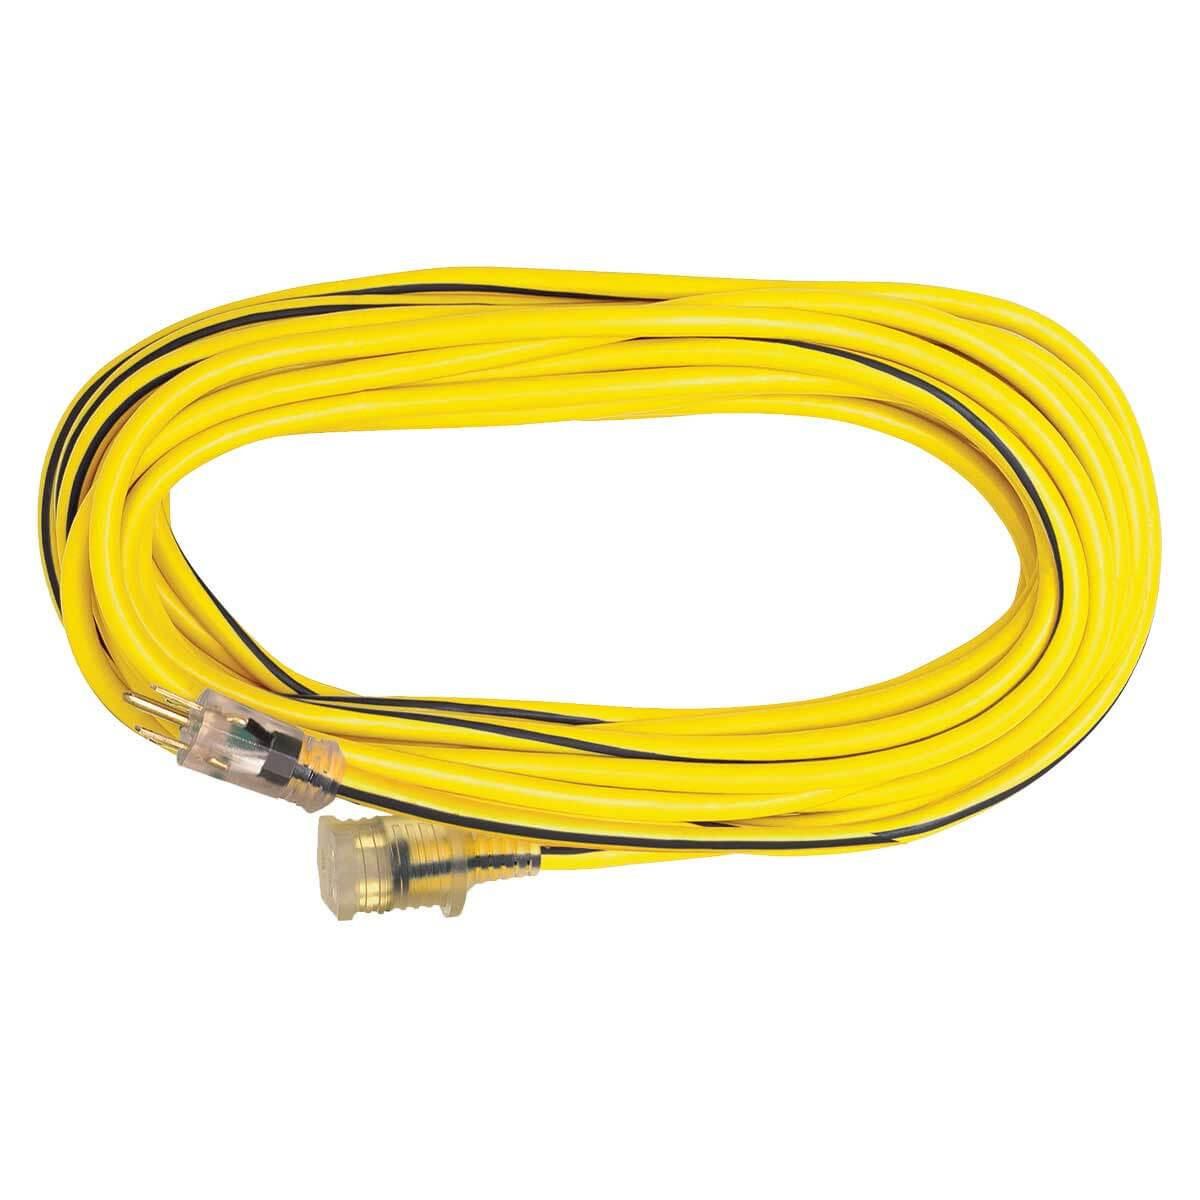 voltec 50ft extension cord